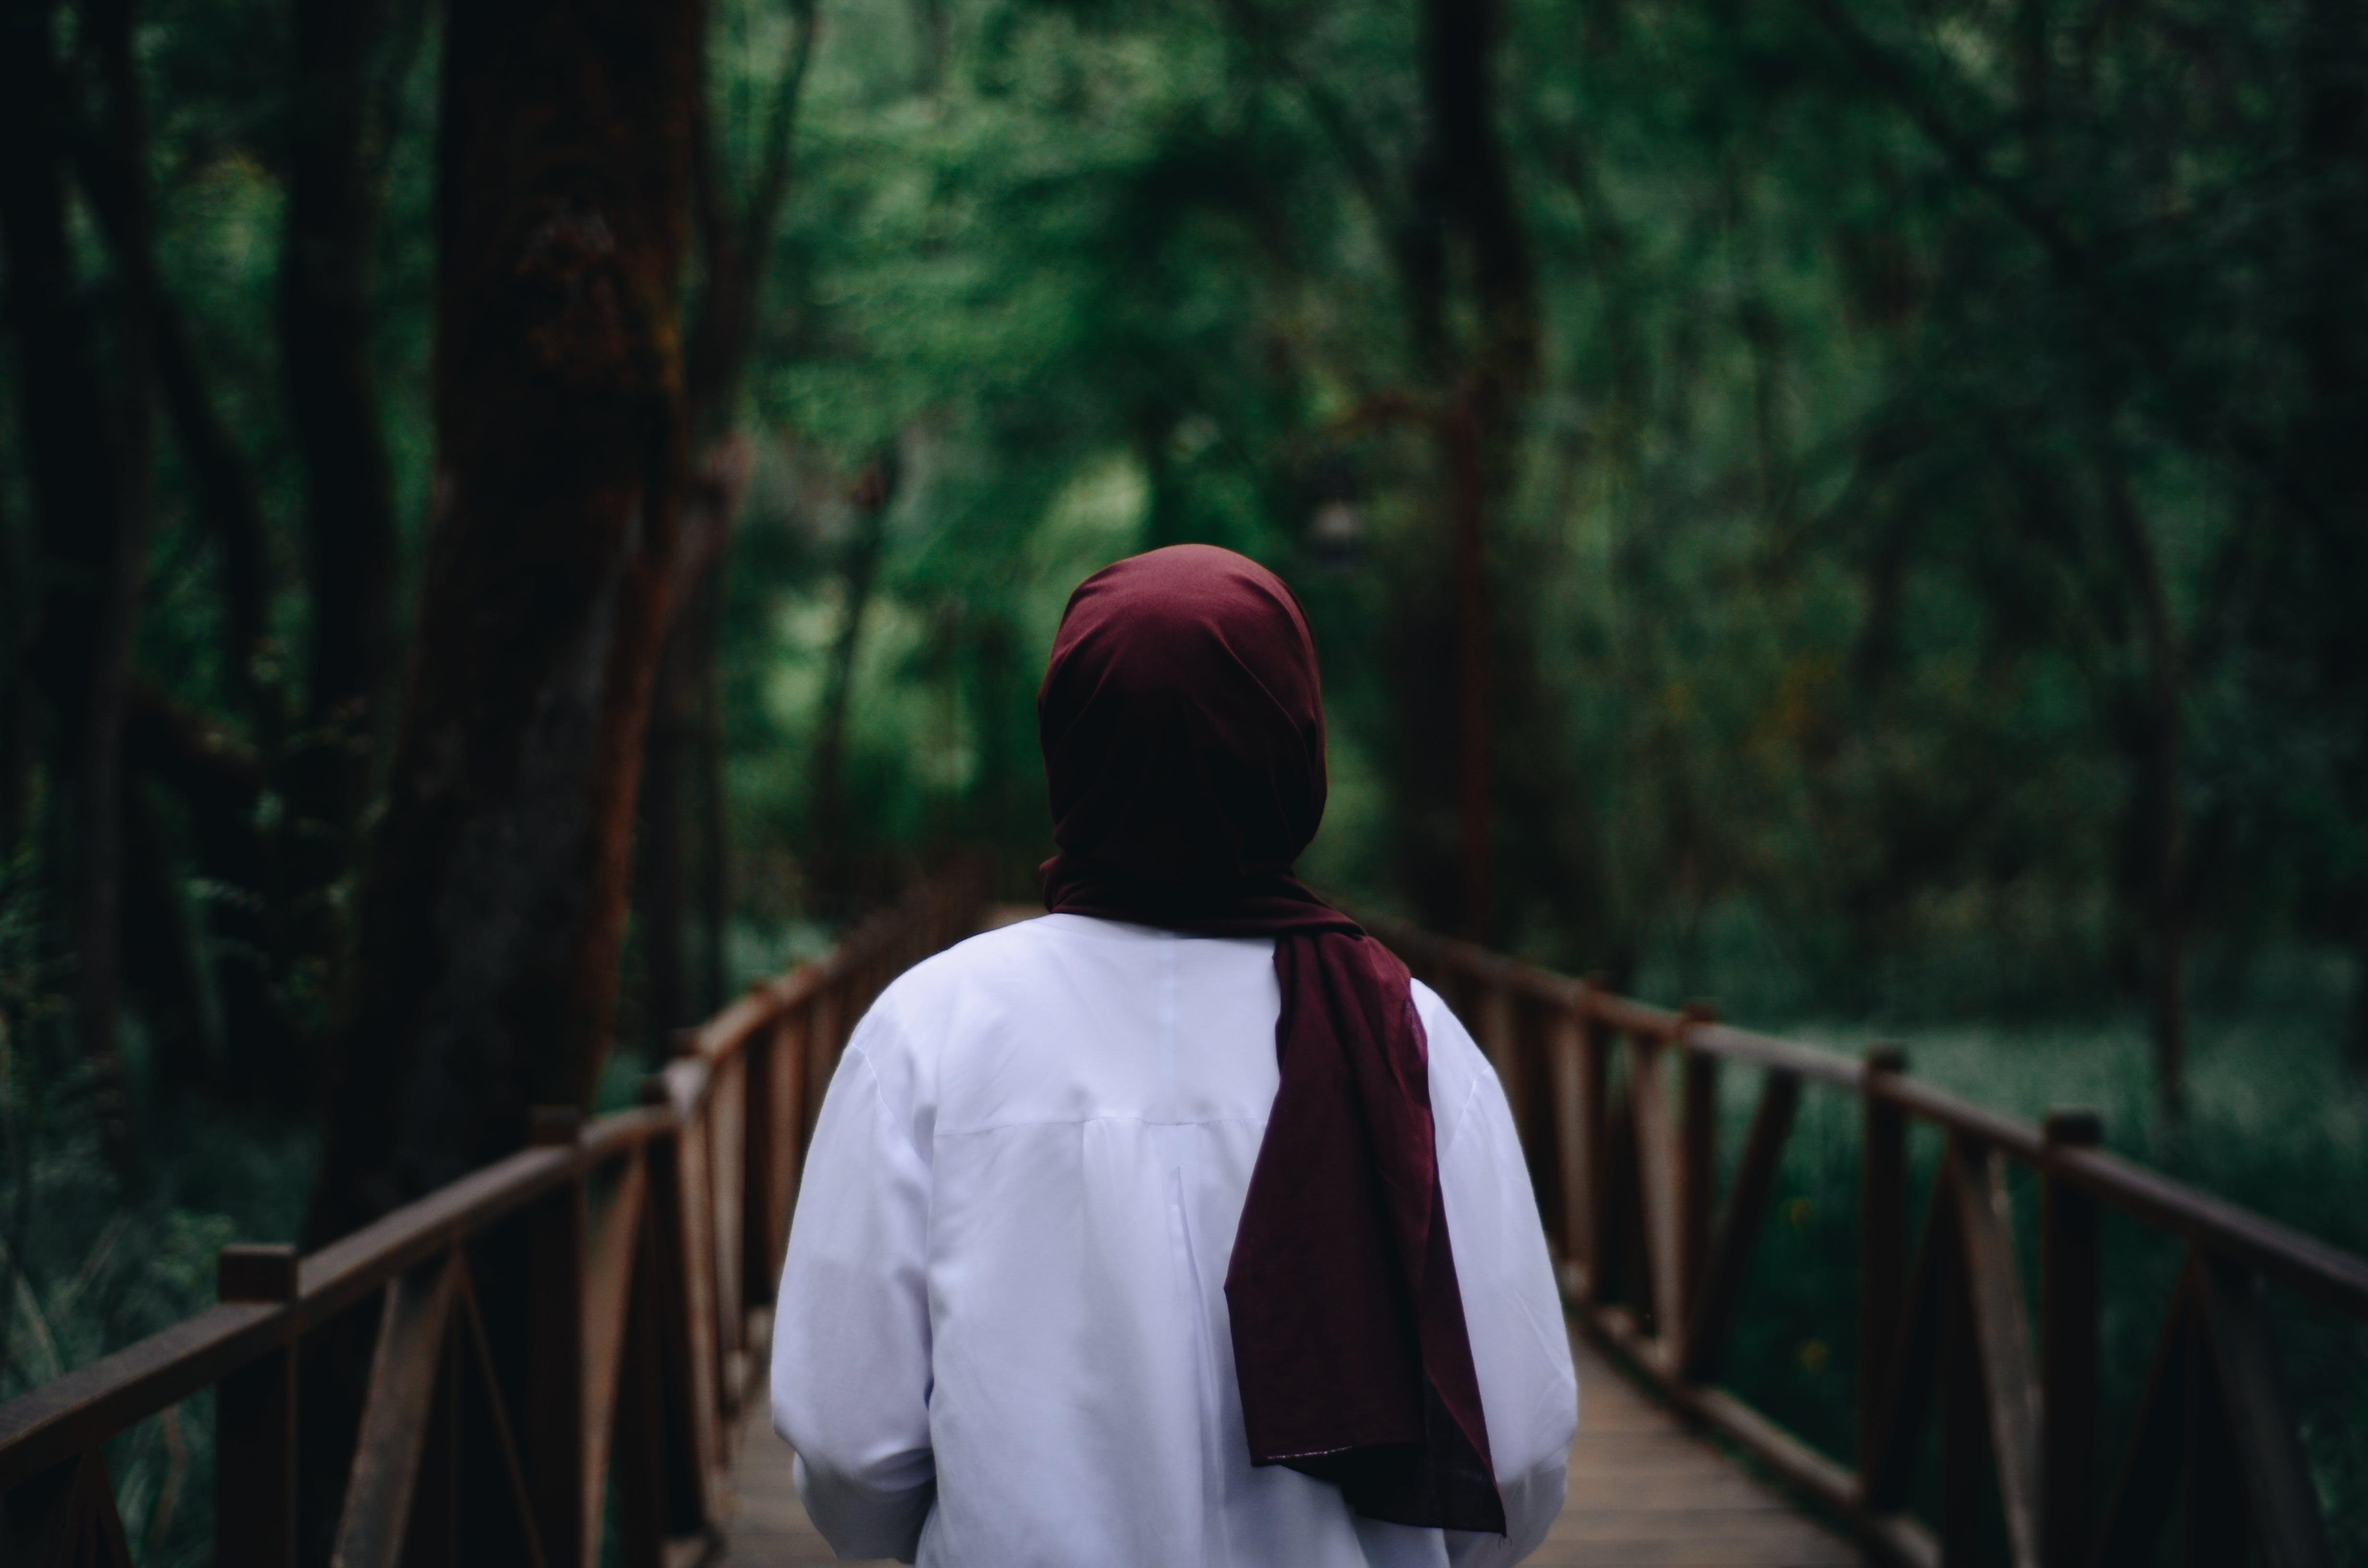 Kostenloses Stock Foto zu frau, hijab, person, schal